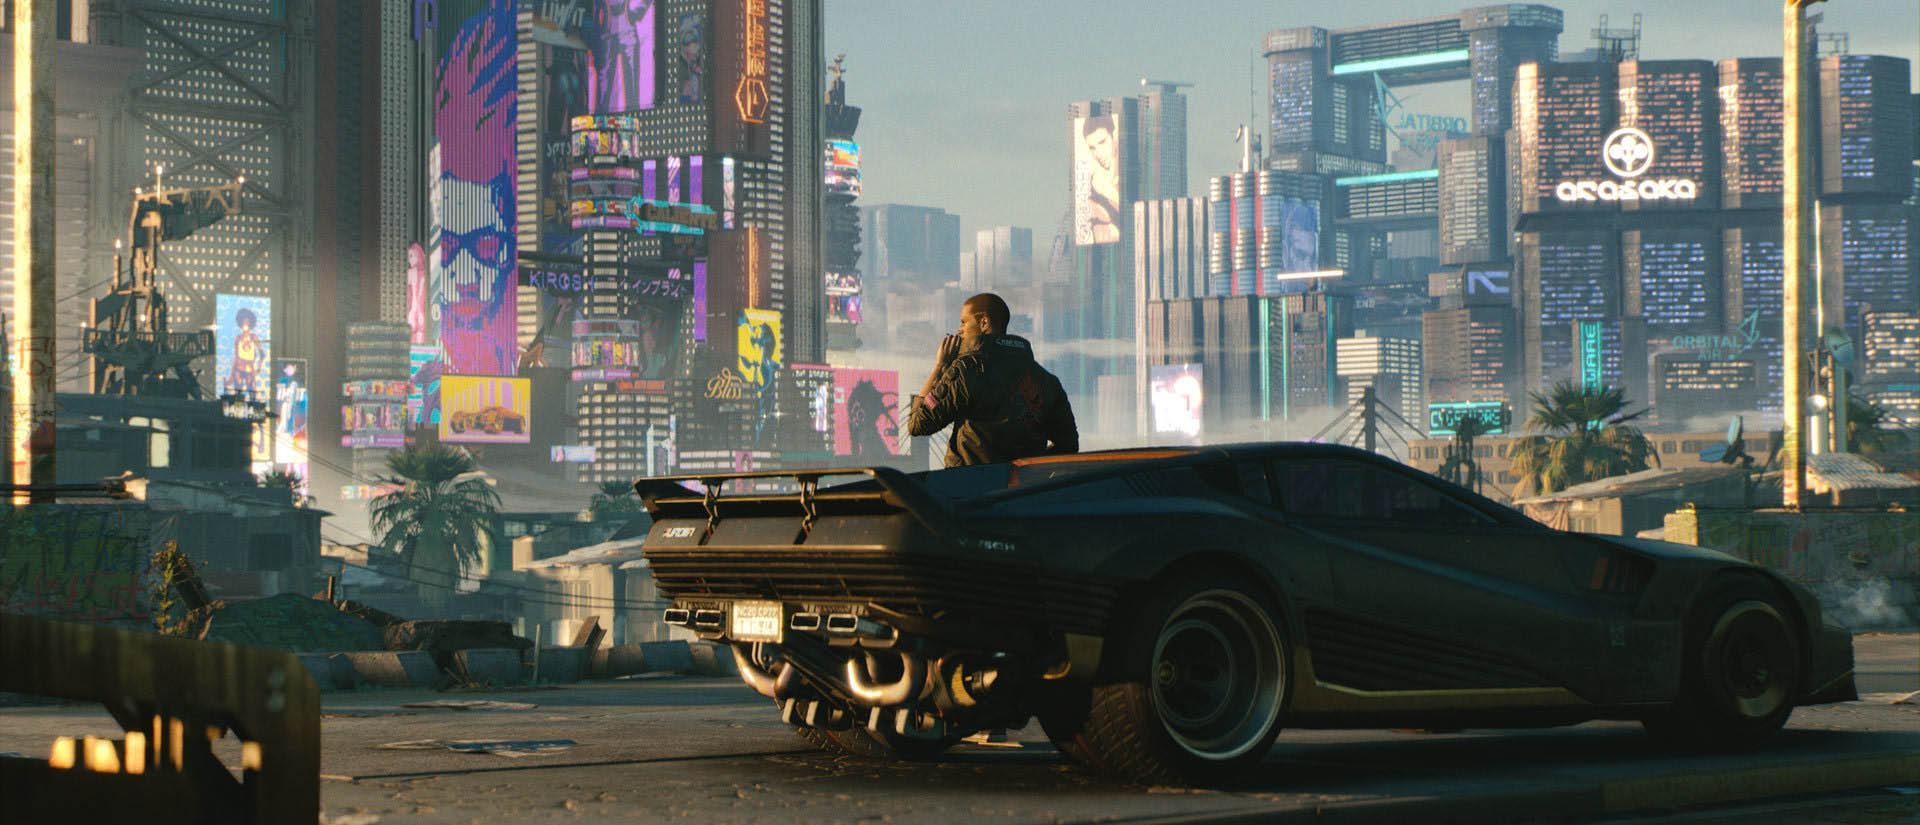 Cyberpunk 2077 - Neuer Trailer und Release enthüllt